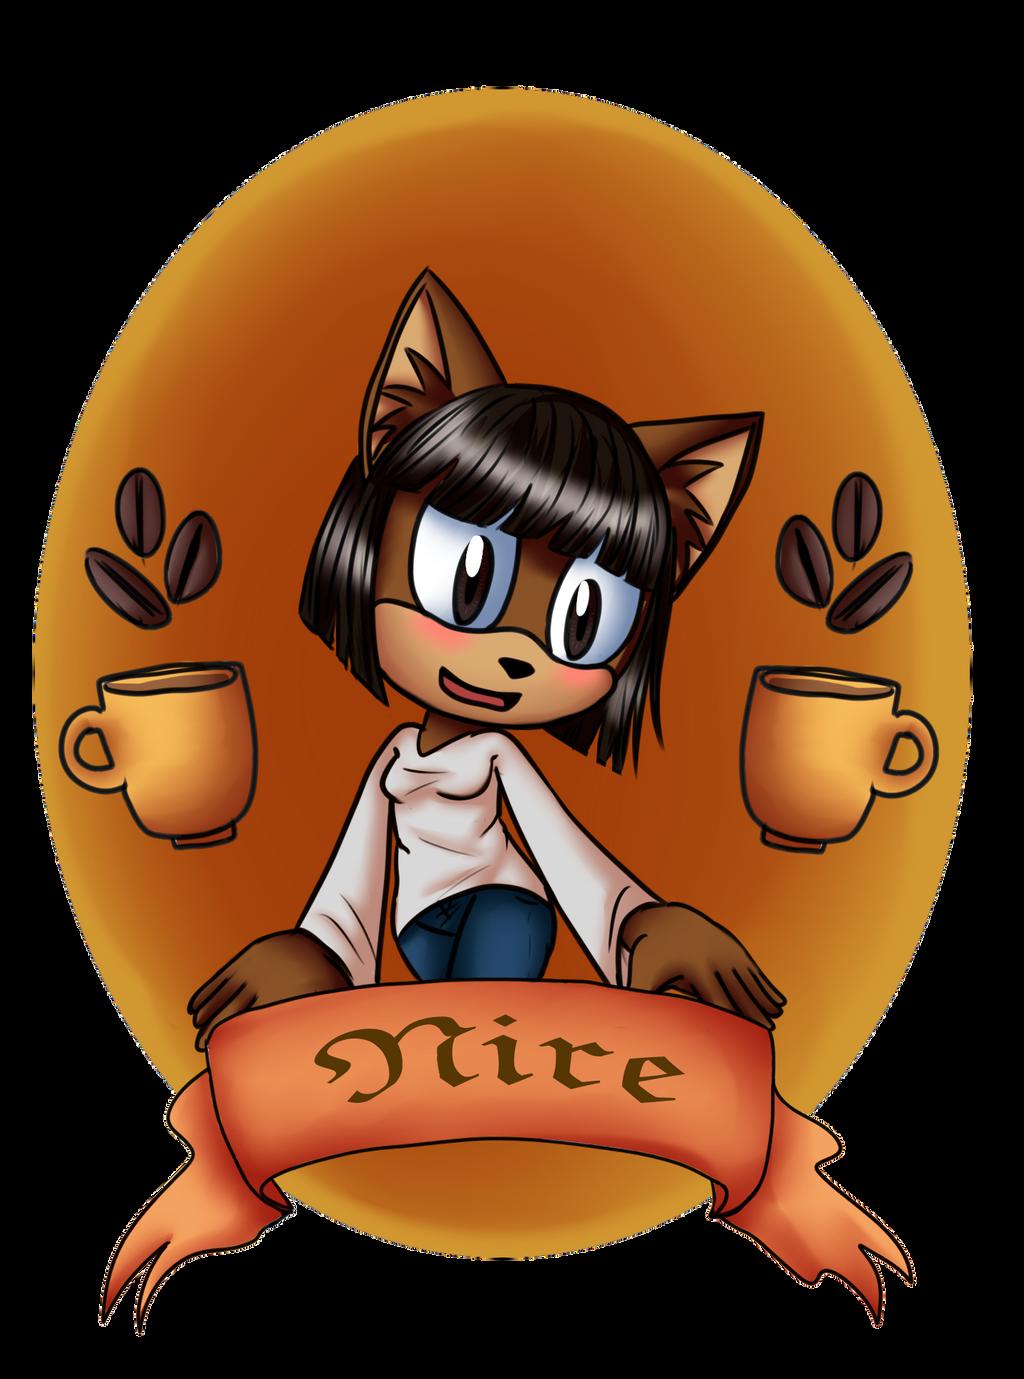 Nire the cat by lizathehedgehog